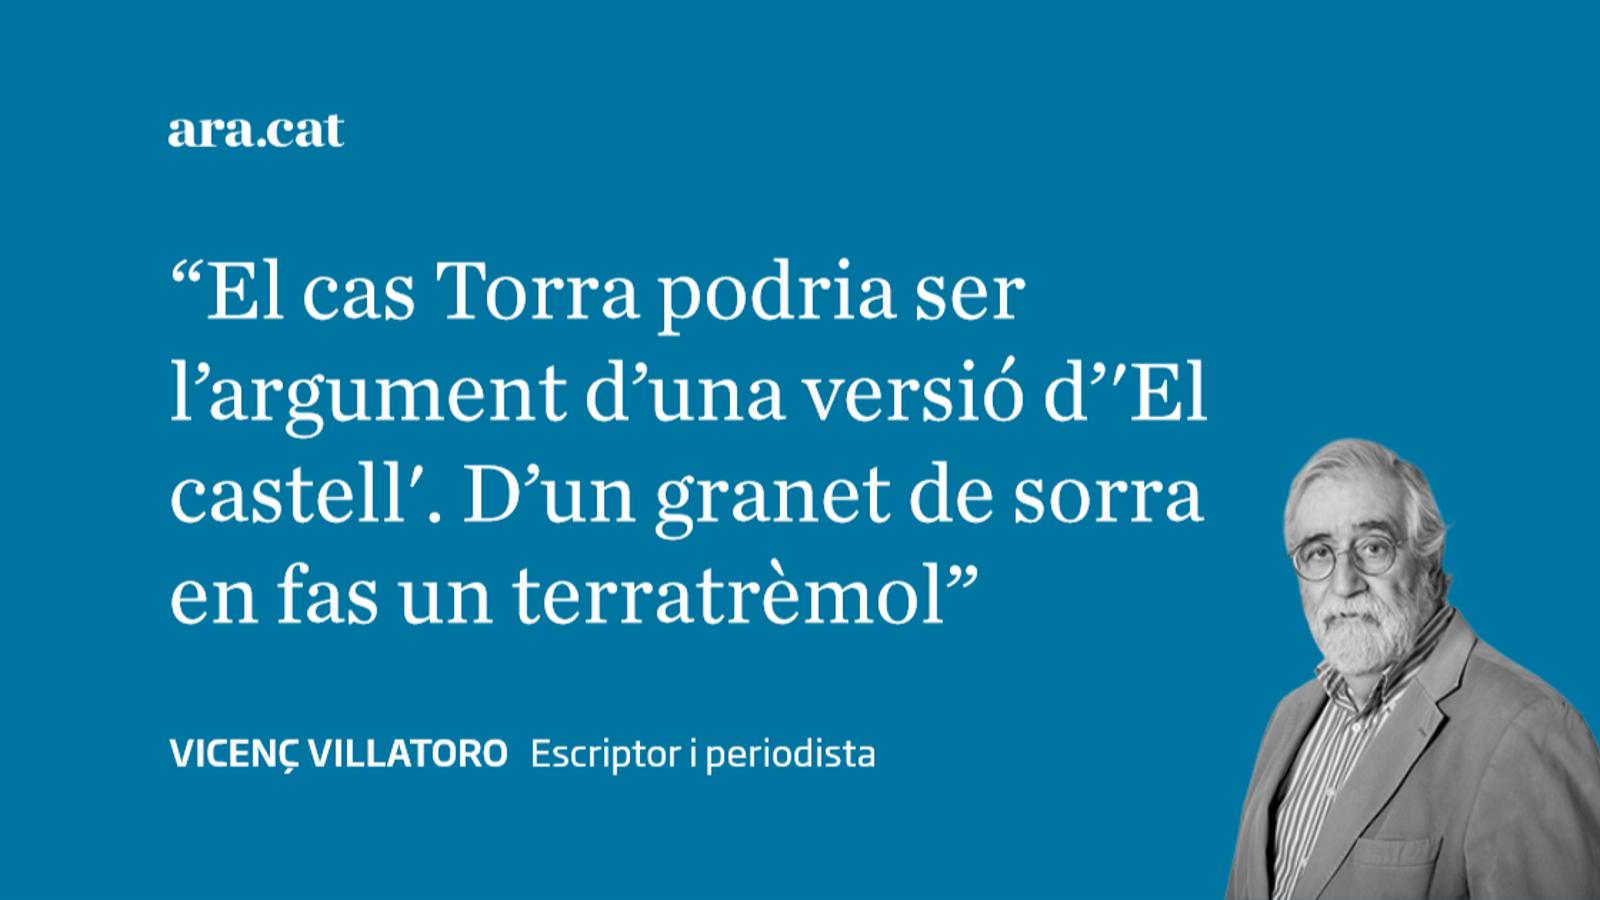 25/1: Torra kafkiana